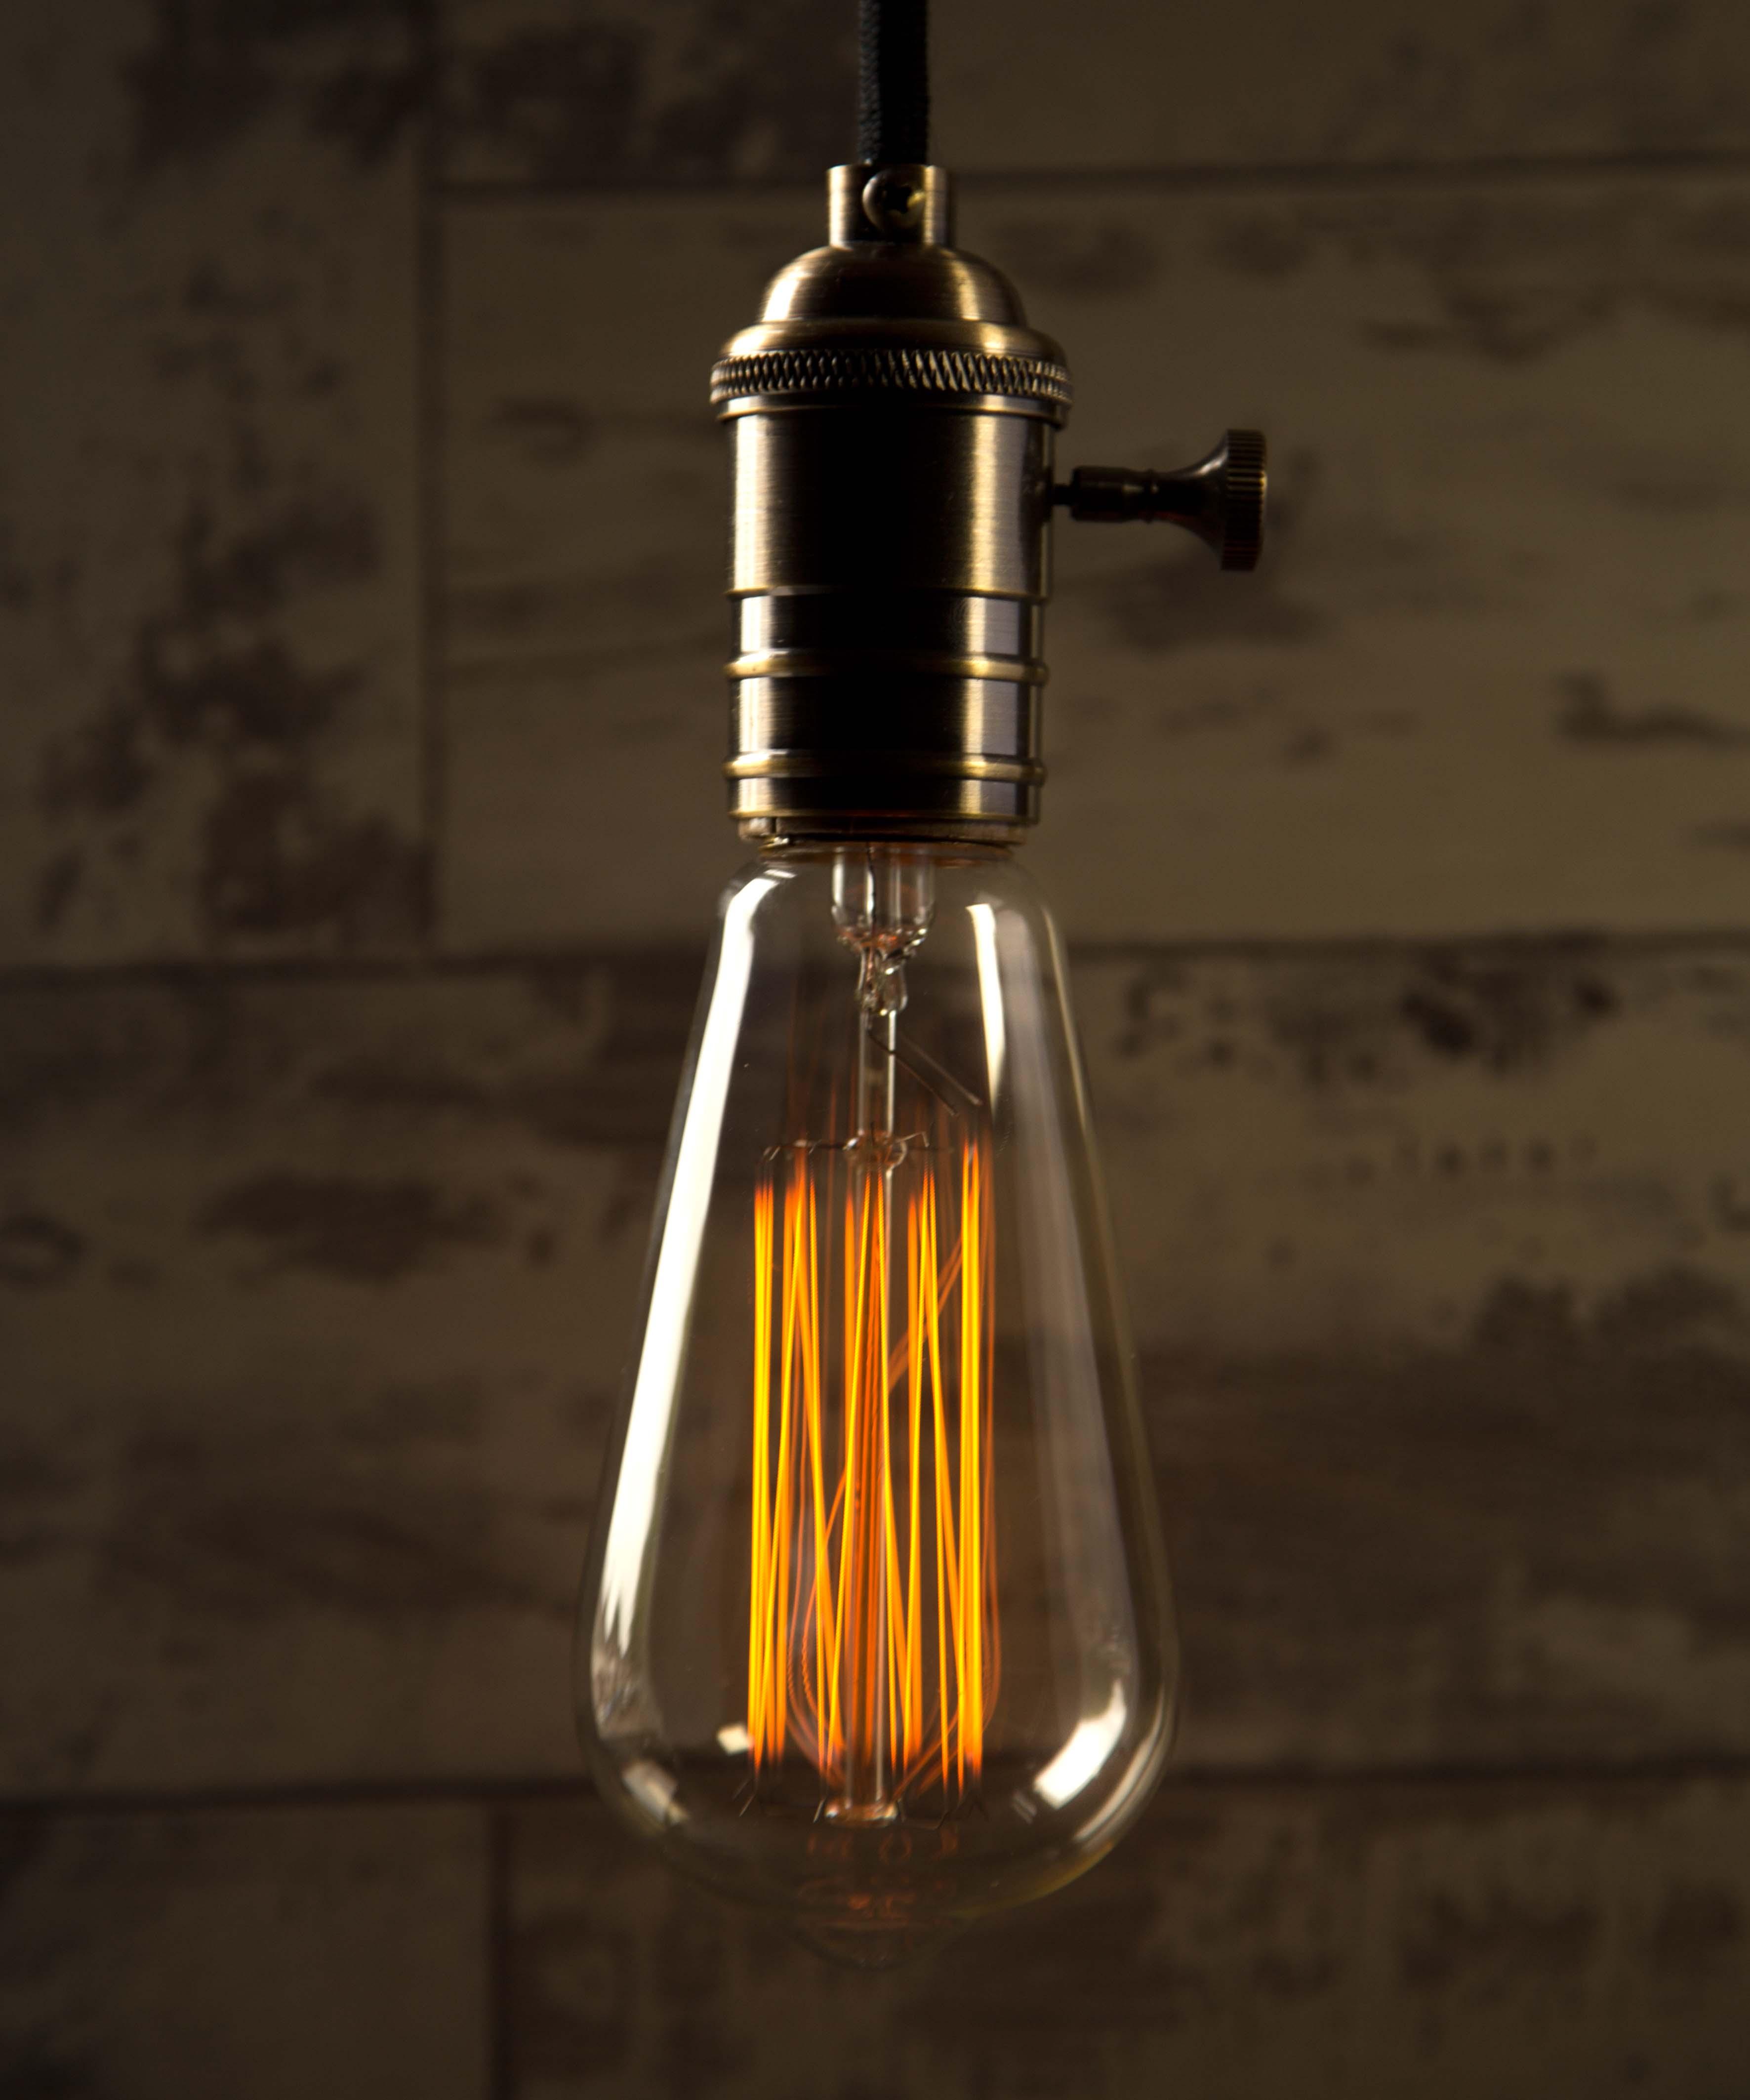 Teardrop st64 william and watson vintage edison bulb industrial light - Large Teardrop Cropped St64 Teardrop Large William And Watson Industrial Vintage Retro Edison Light Bulb